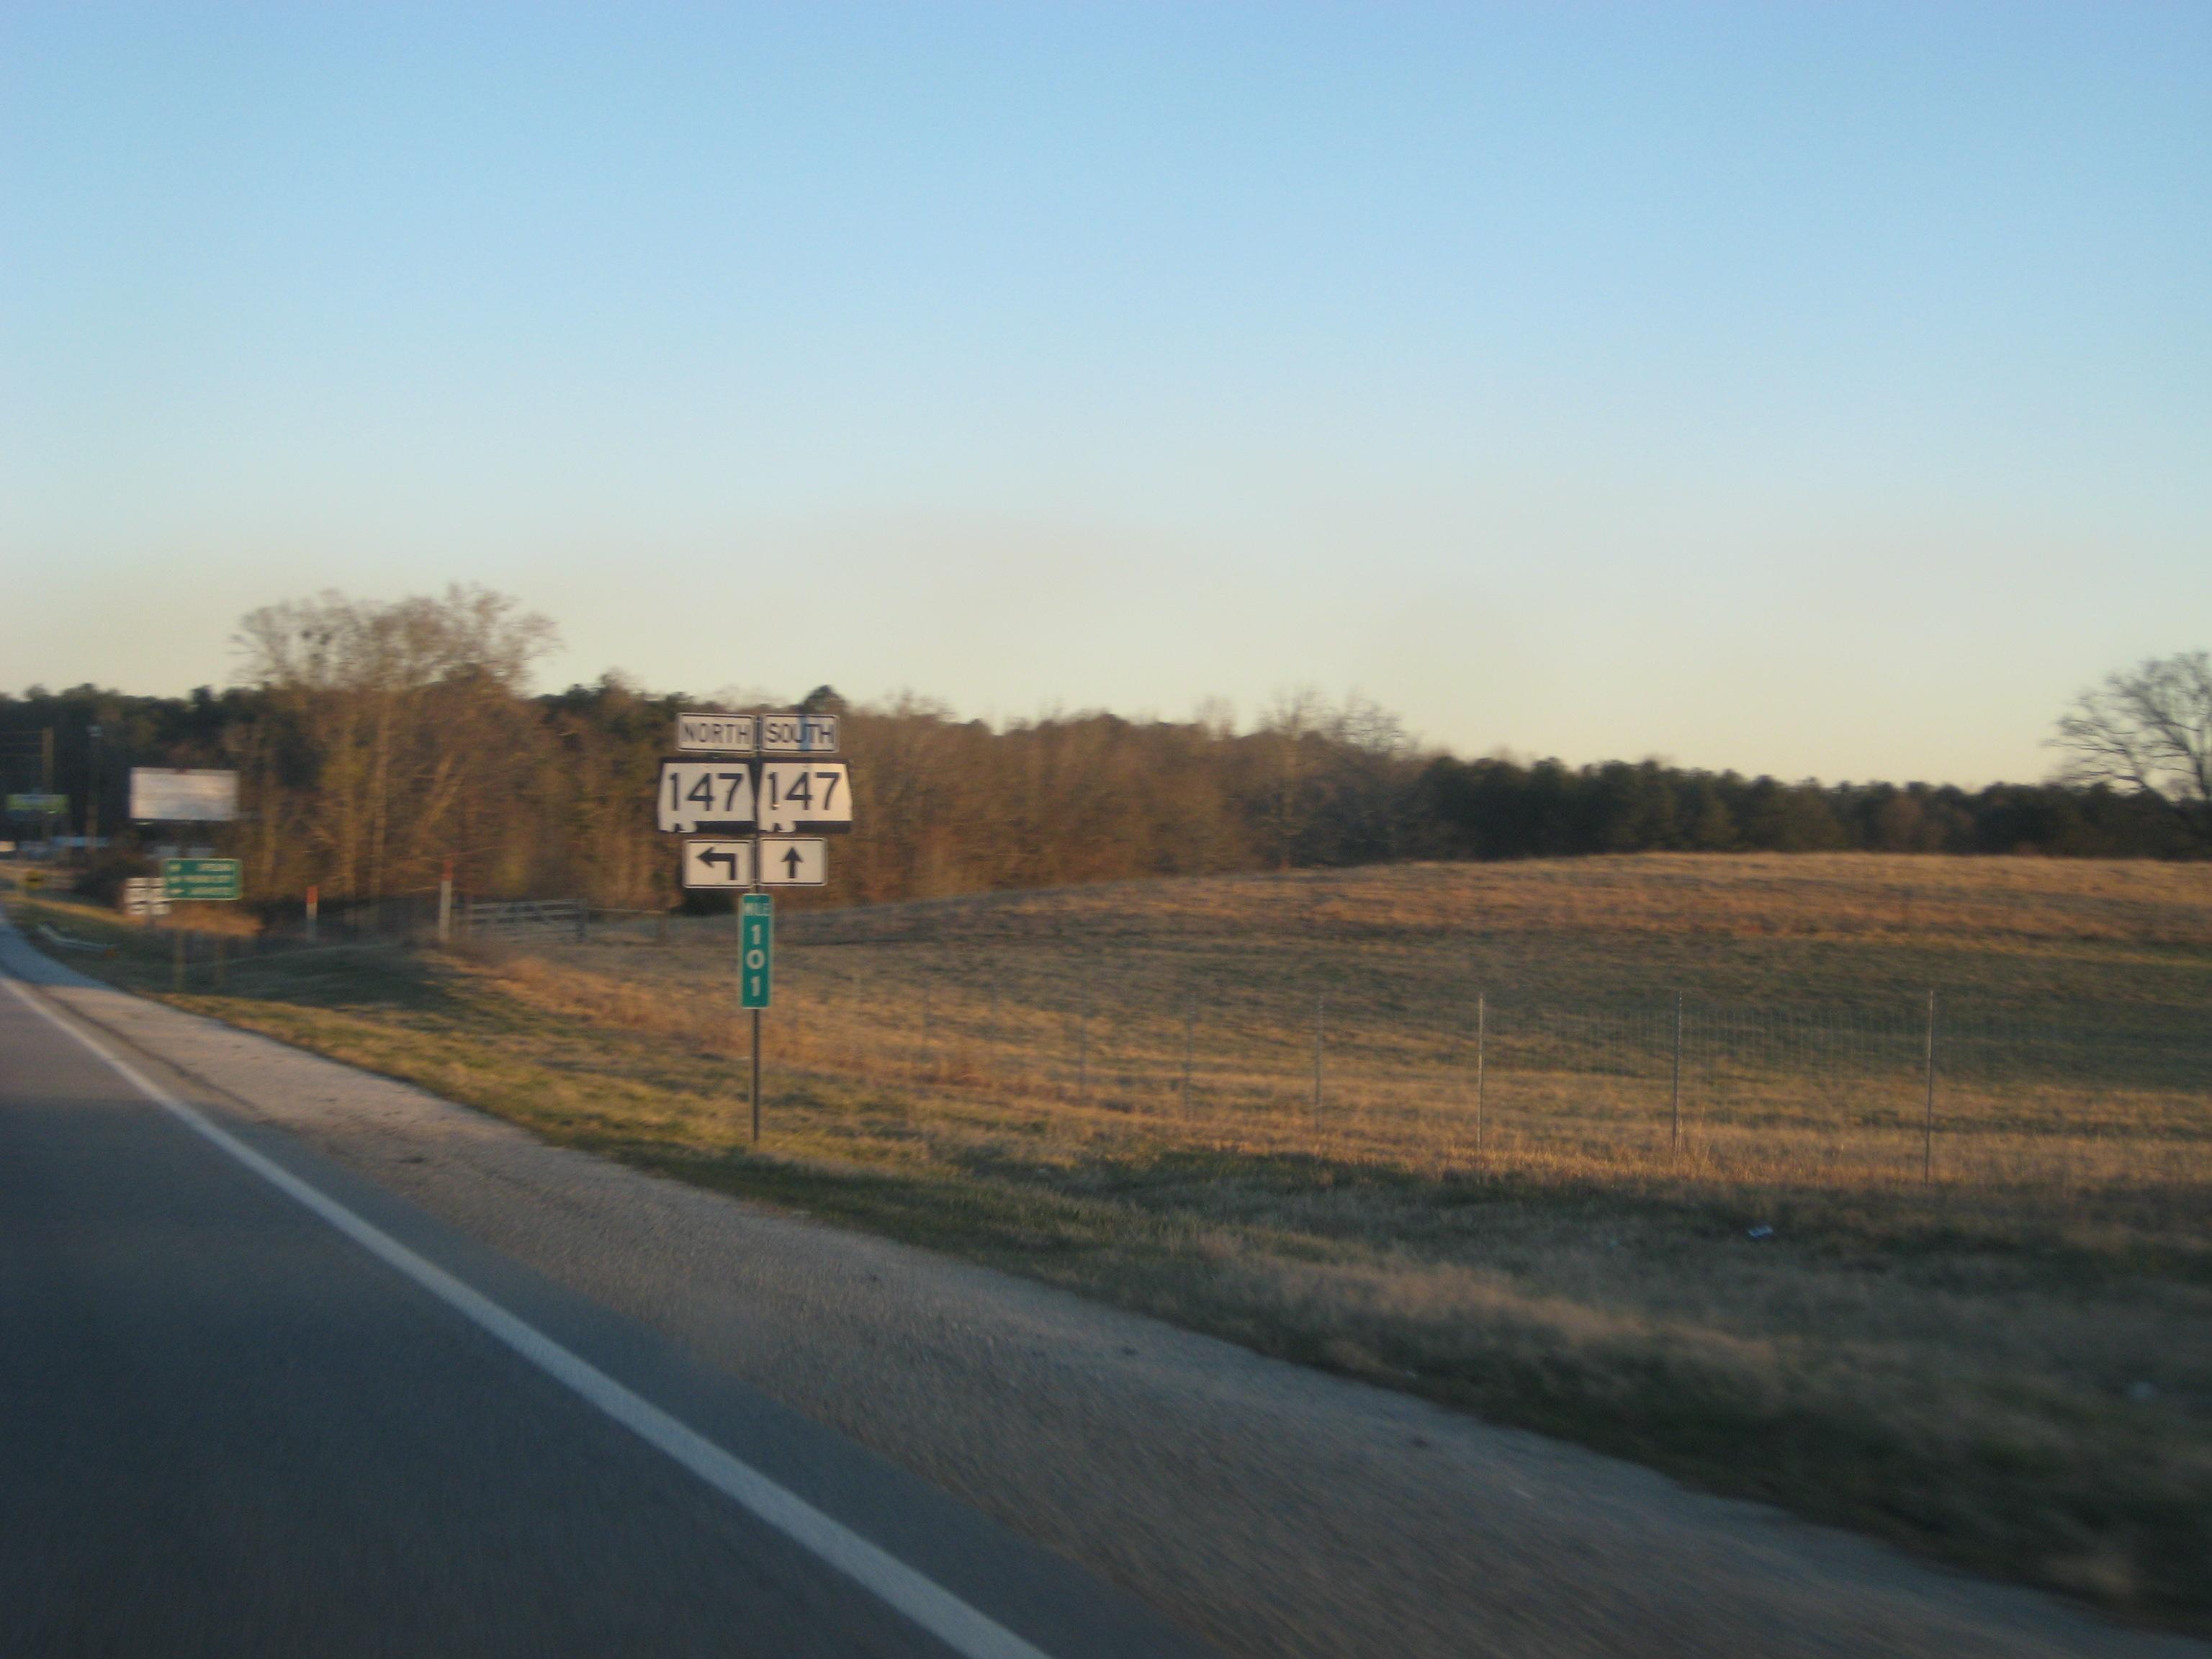 Highway 147 Lee County, Alabama